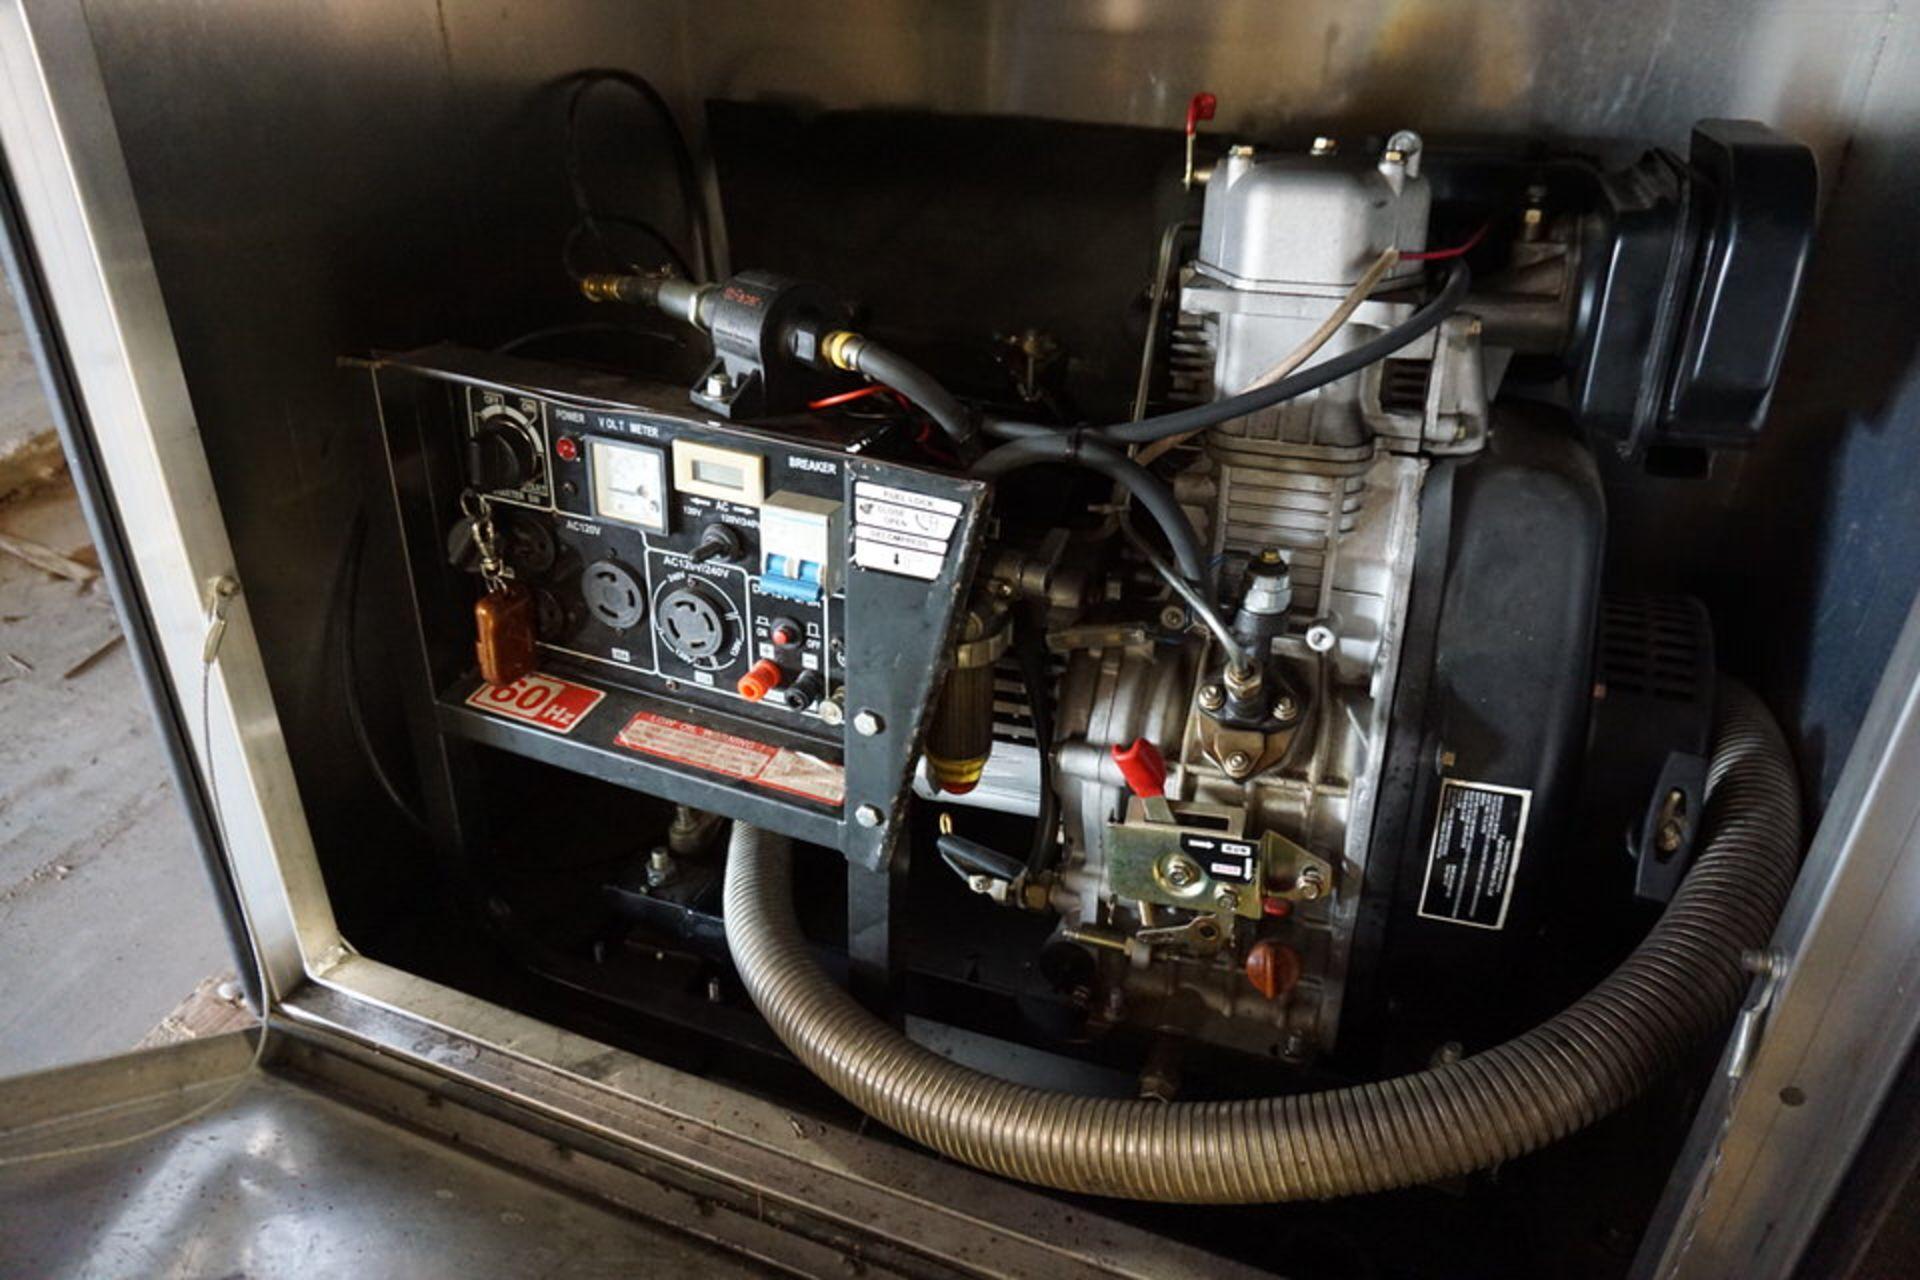 Lot 48 - PRO TECH GENERATOR IN CABINET (Location: 903 Blue Starr, Claremore, OK 74017)